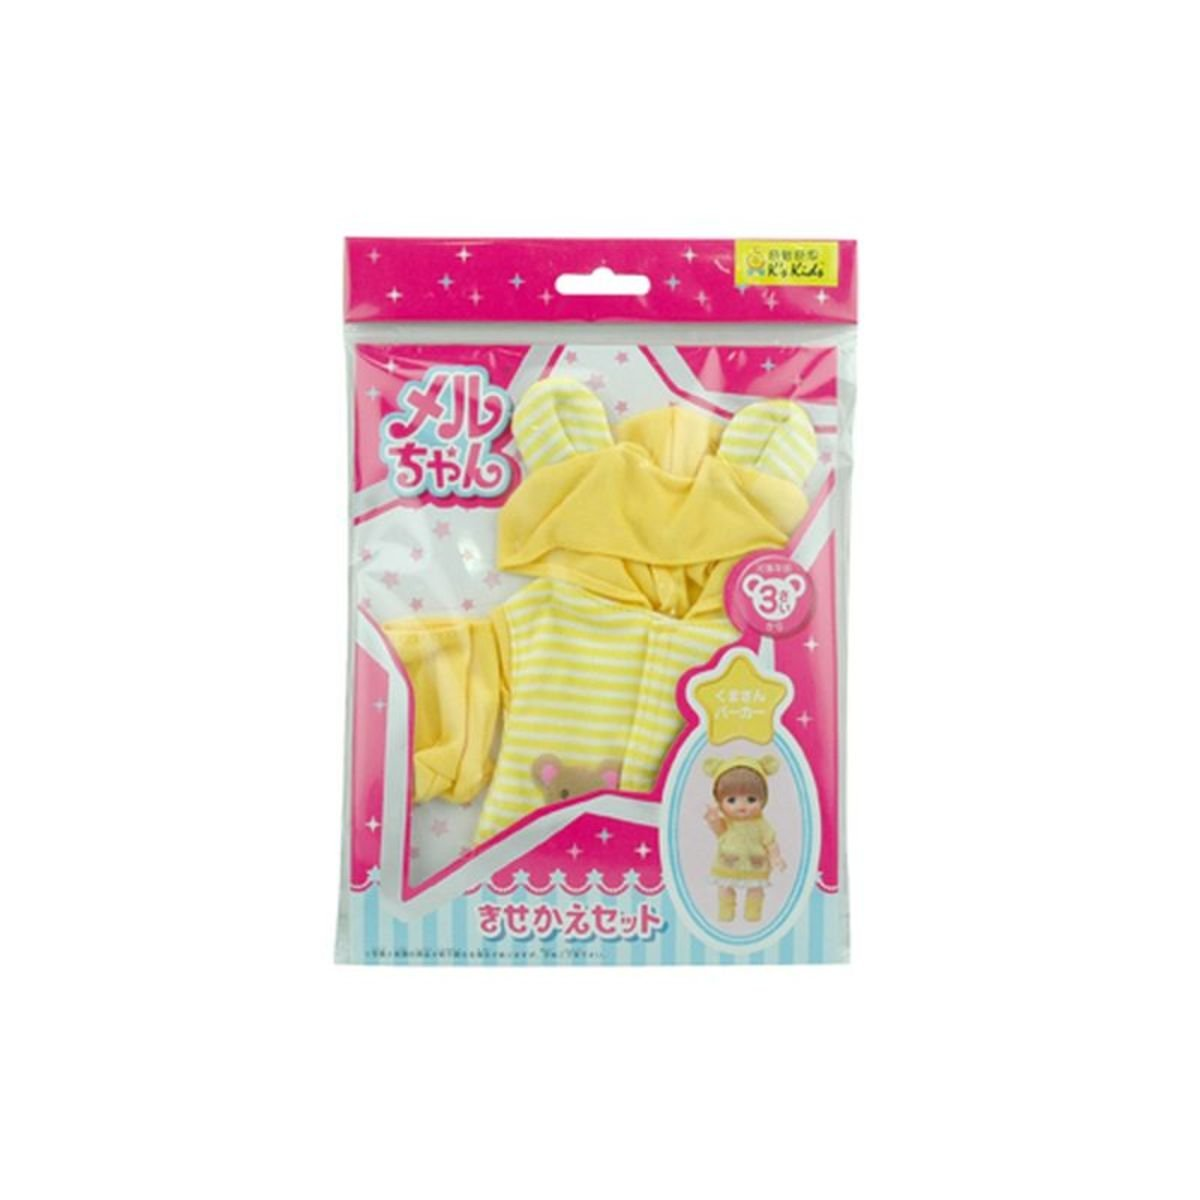 M51019- 黃色熊仔帽連身裙套裝